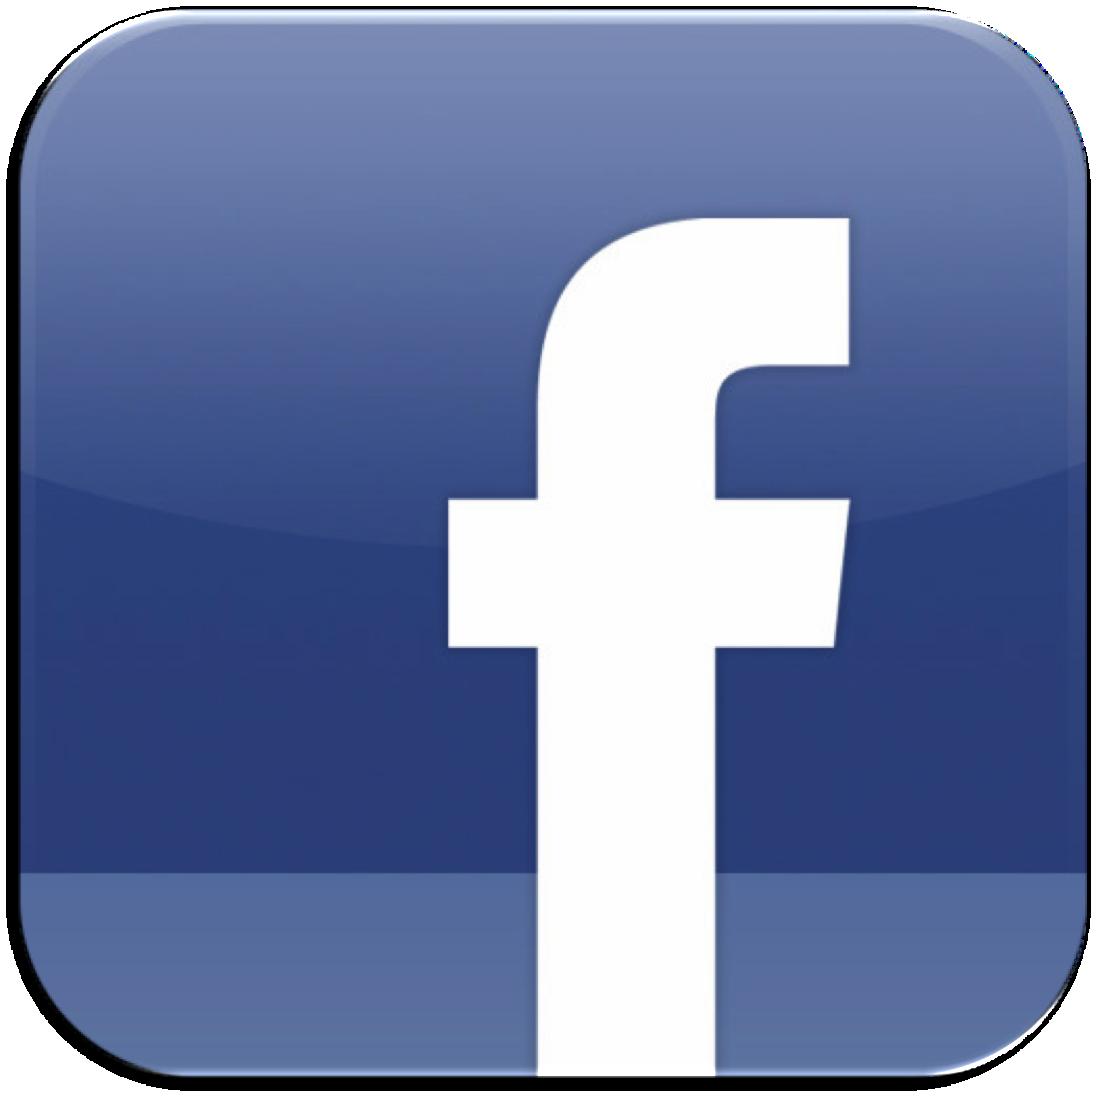 697057-facebook-512.png